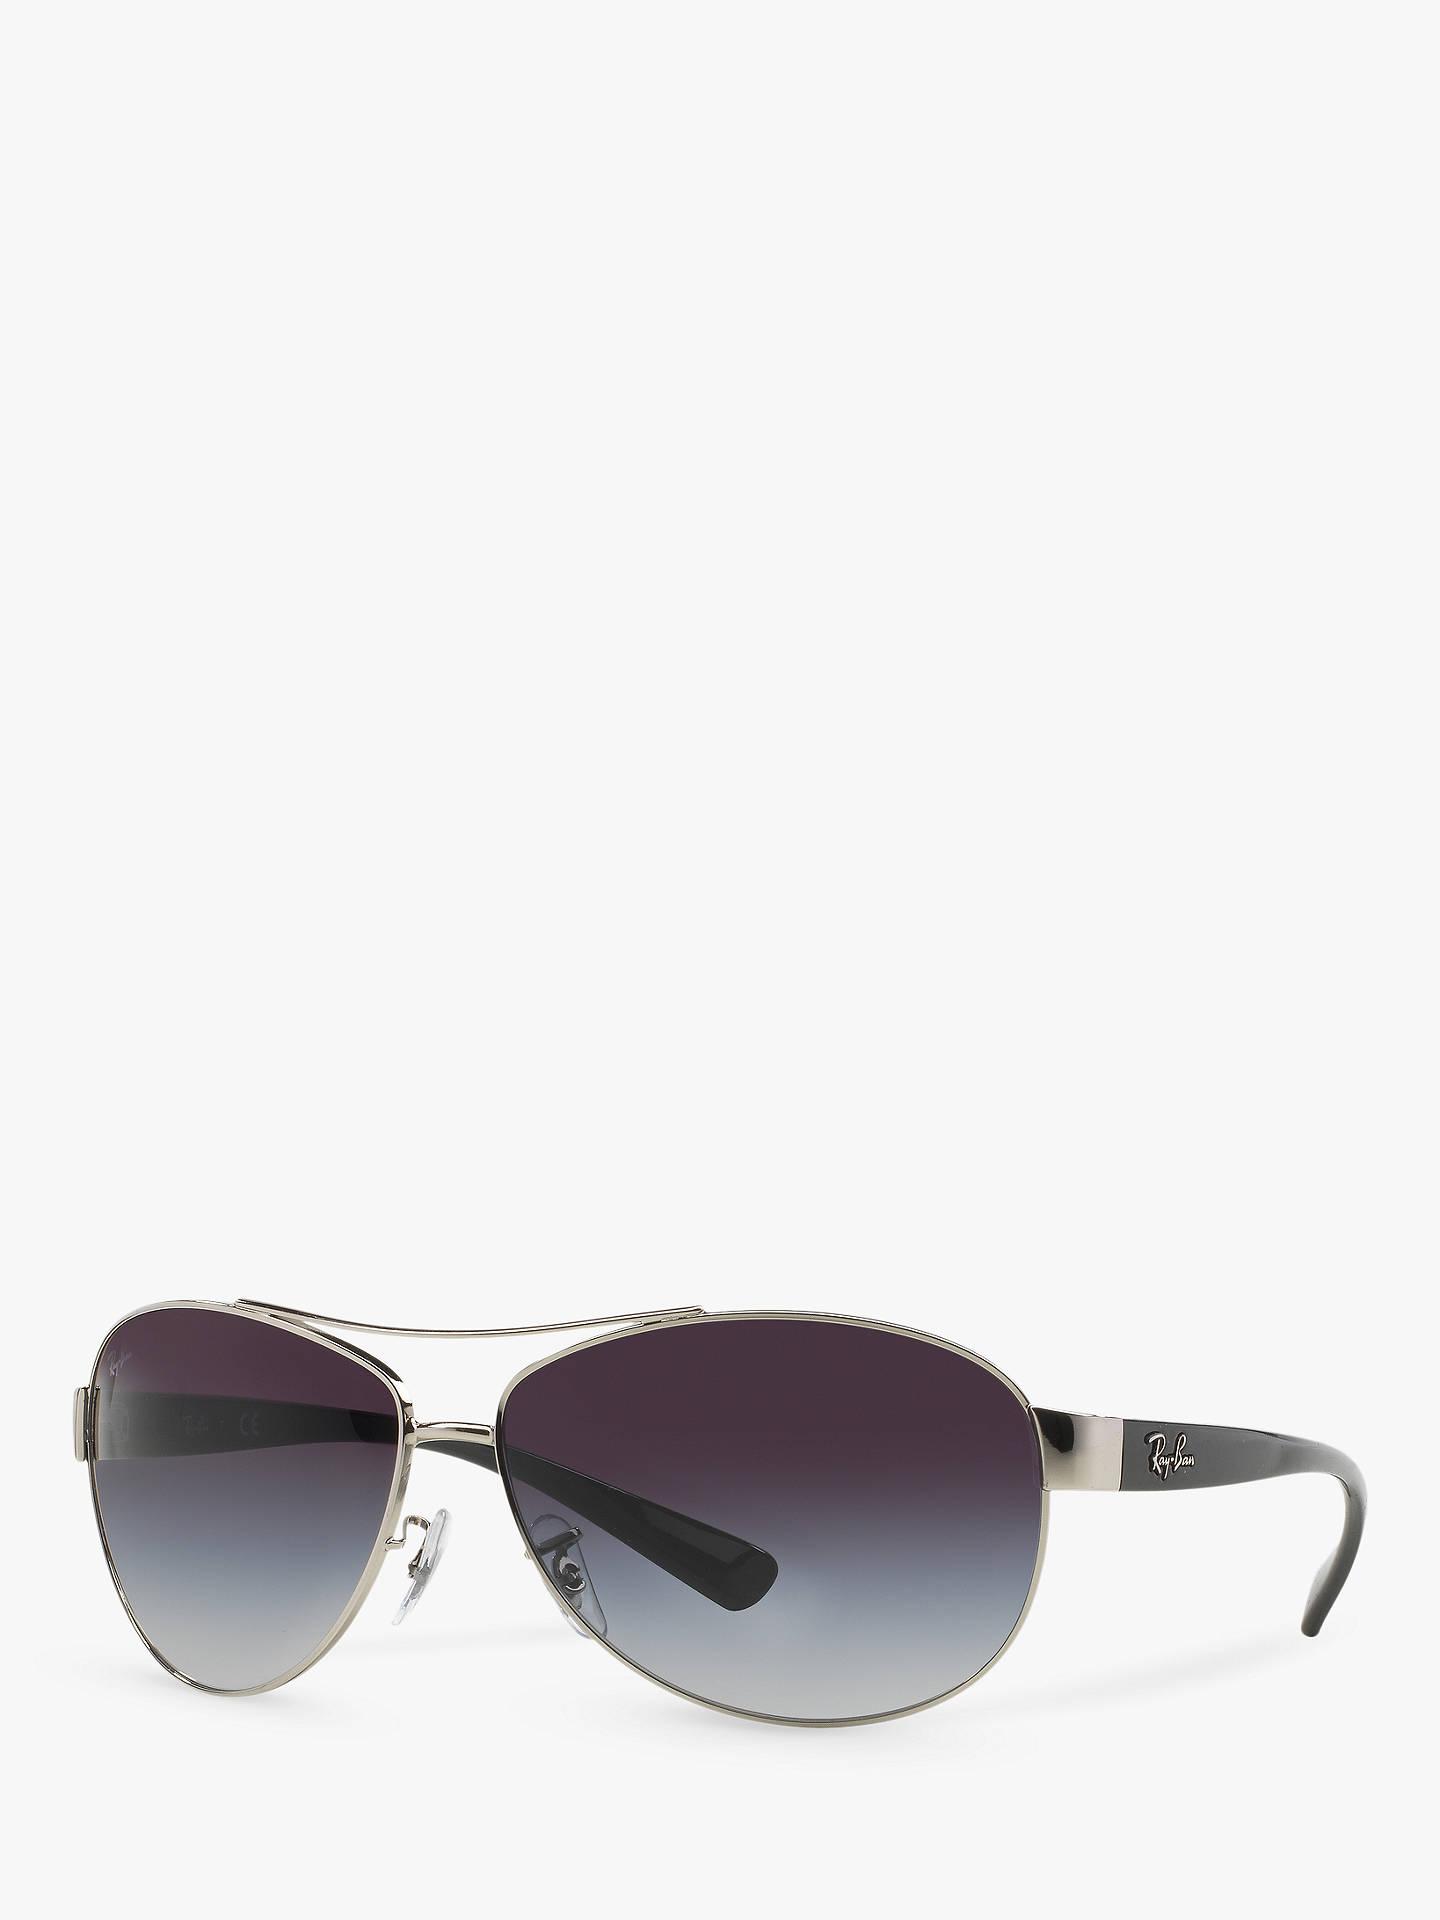 aecba2a8b6 BuyRay-Ban RB3386 Men s Aviator Sunglasses